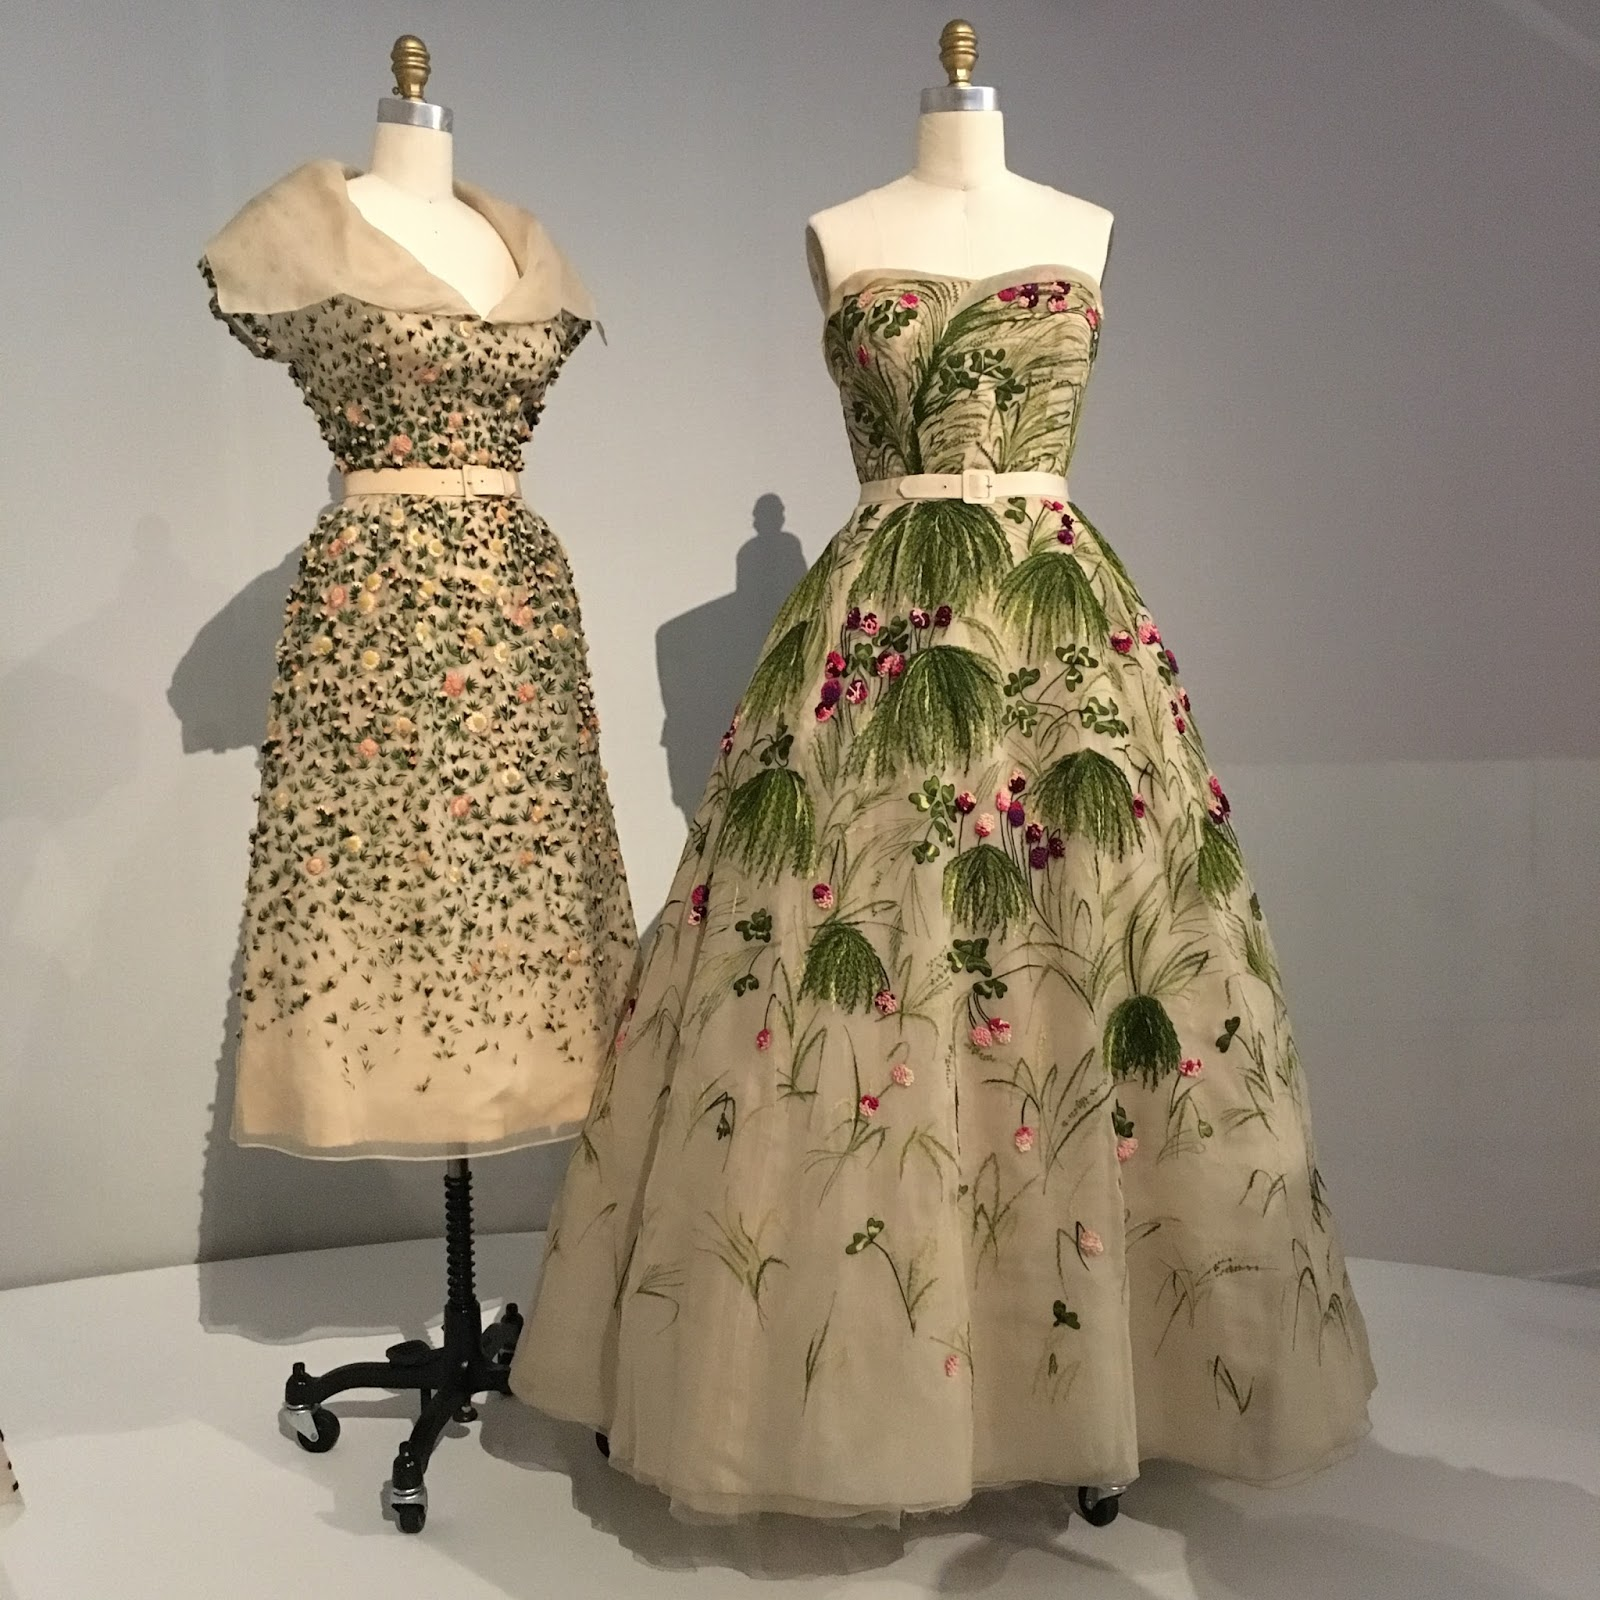 manus machina fashion technology exhibit nyc